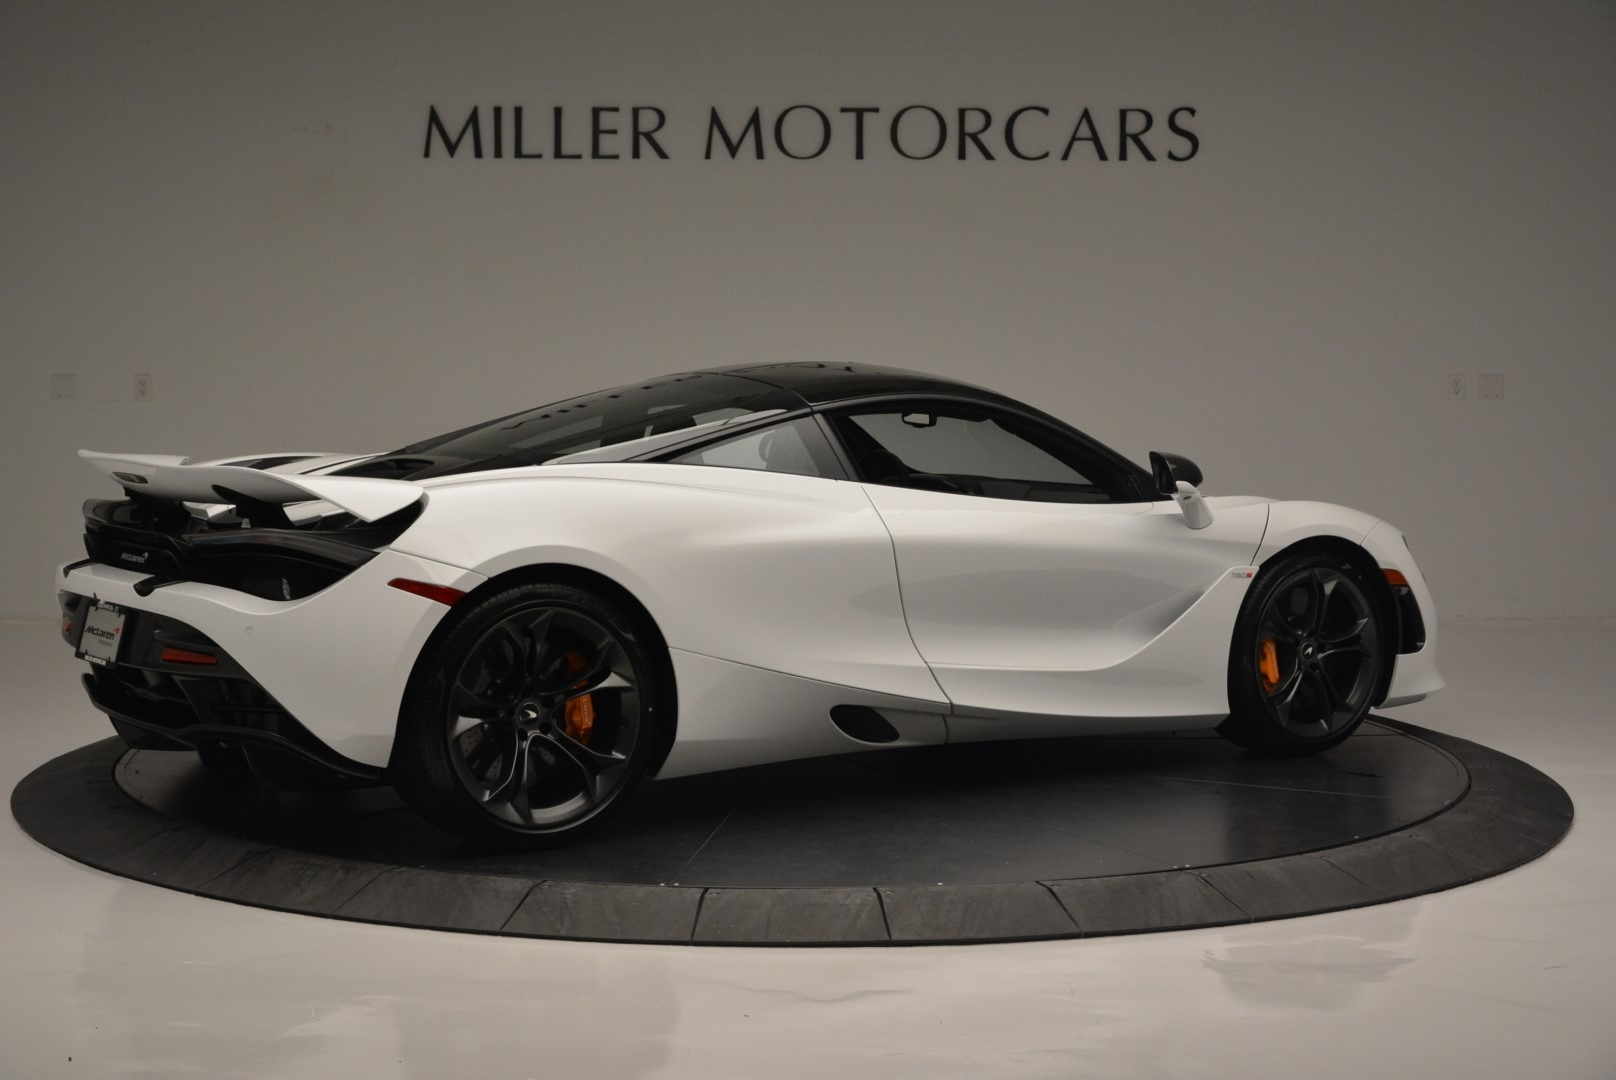 Used 2019 McLaren 720S Coupe For Sale In Westport, CT 2543_p8